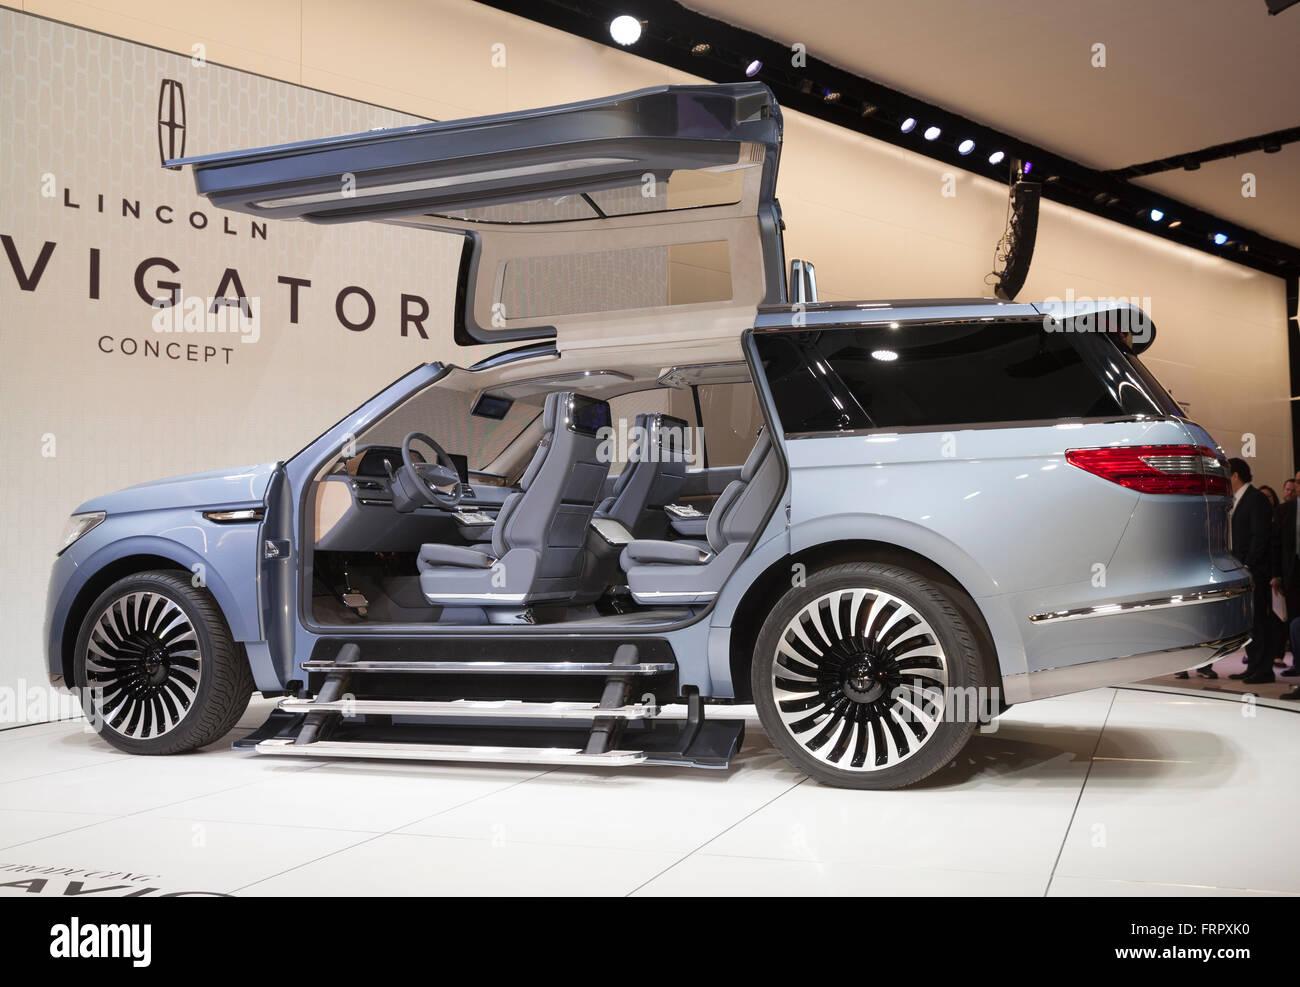 https://c8.alamy.com/comp/FRPXK0/new-york-usa-23rd-march-2016-lincoln-navigator-concept-car-on-display-FRPXK0.jpg